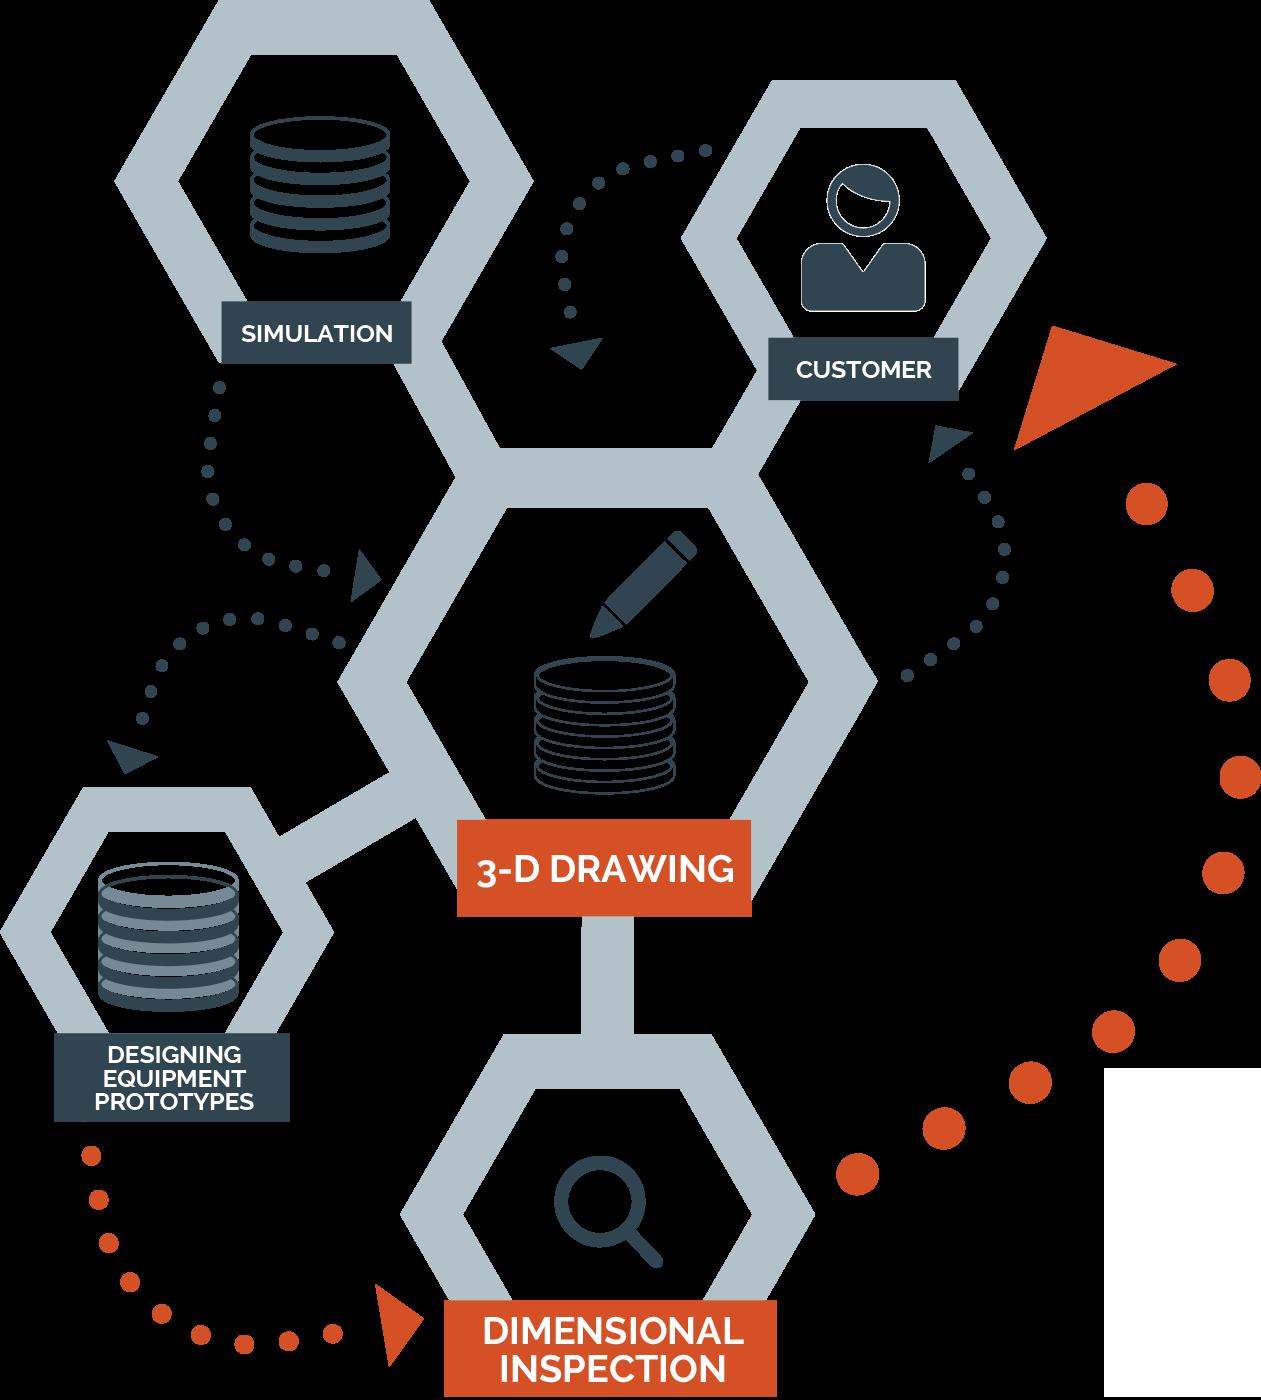 Standard services 3D design